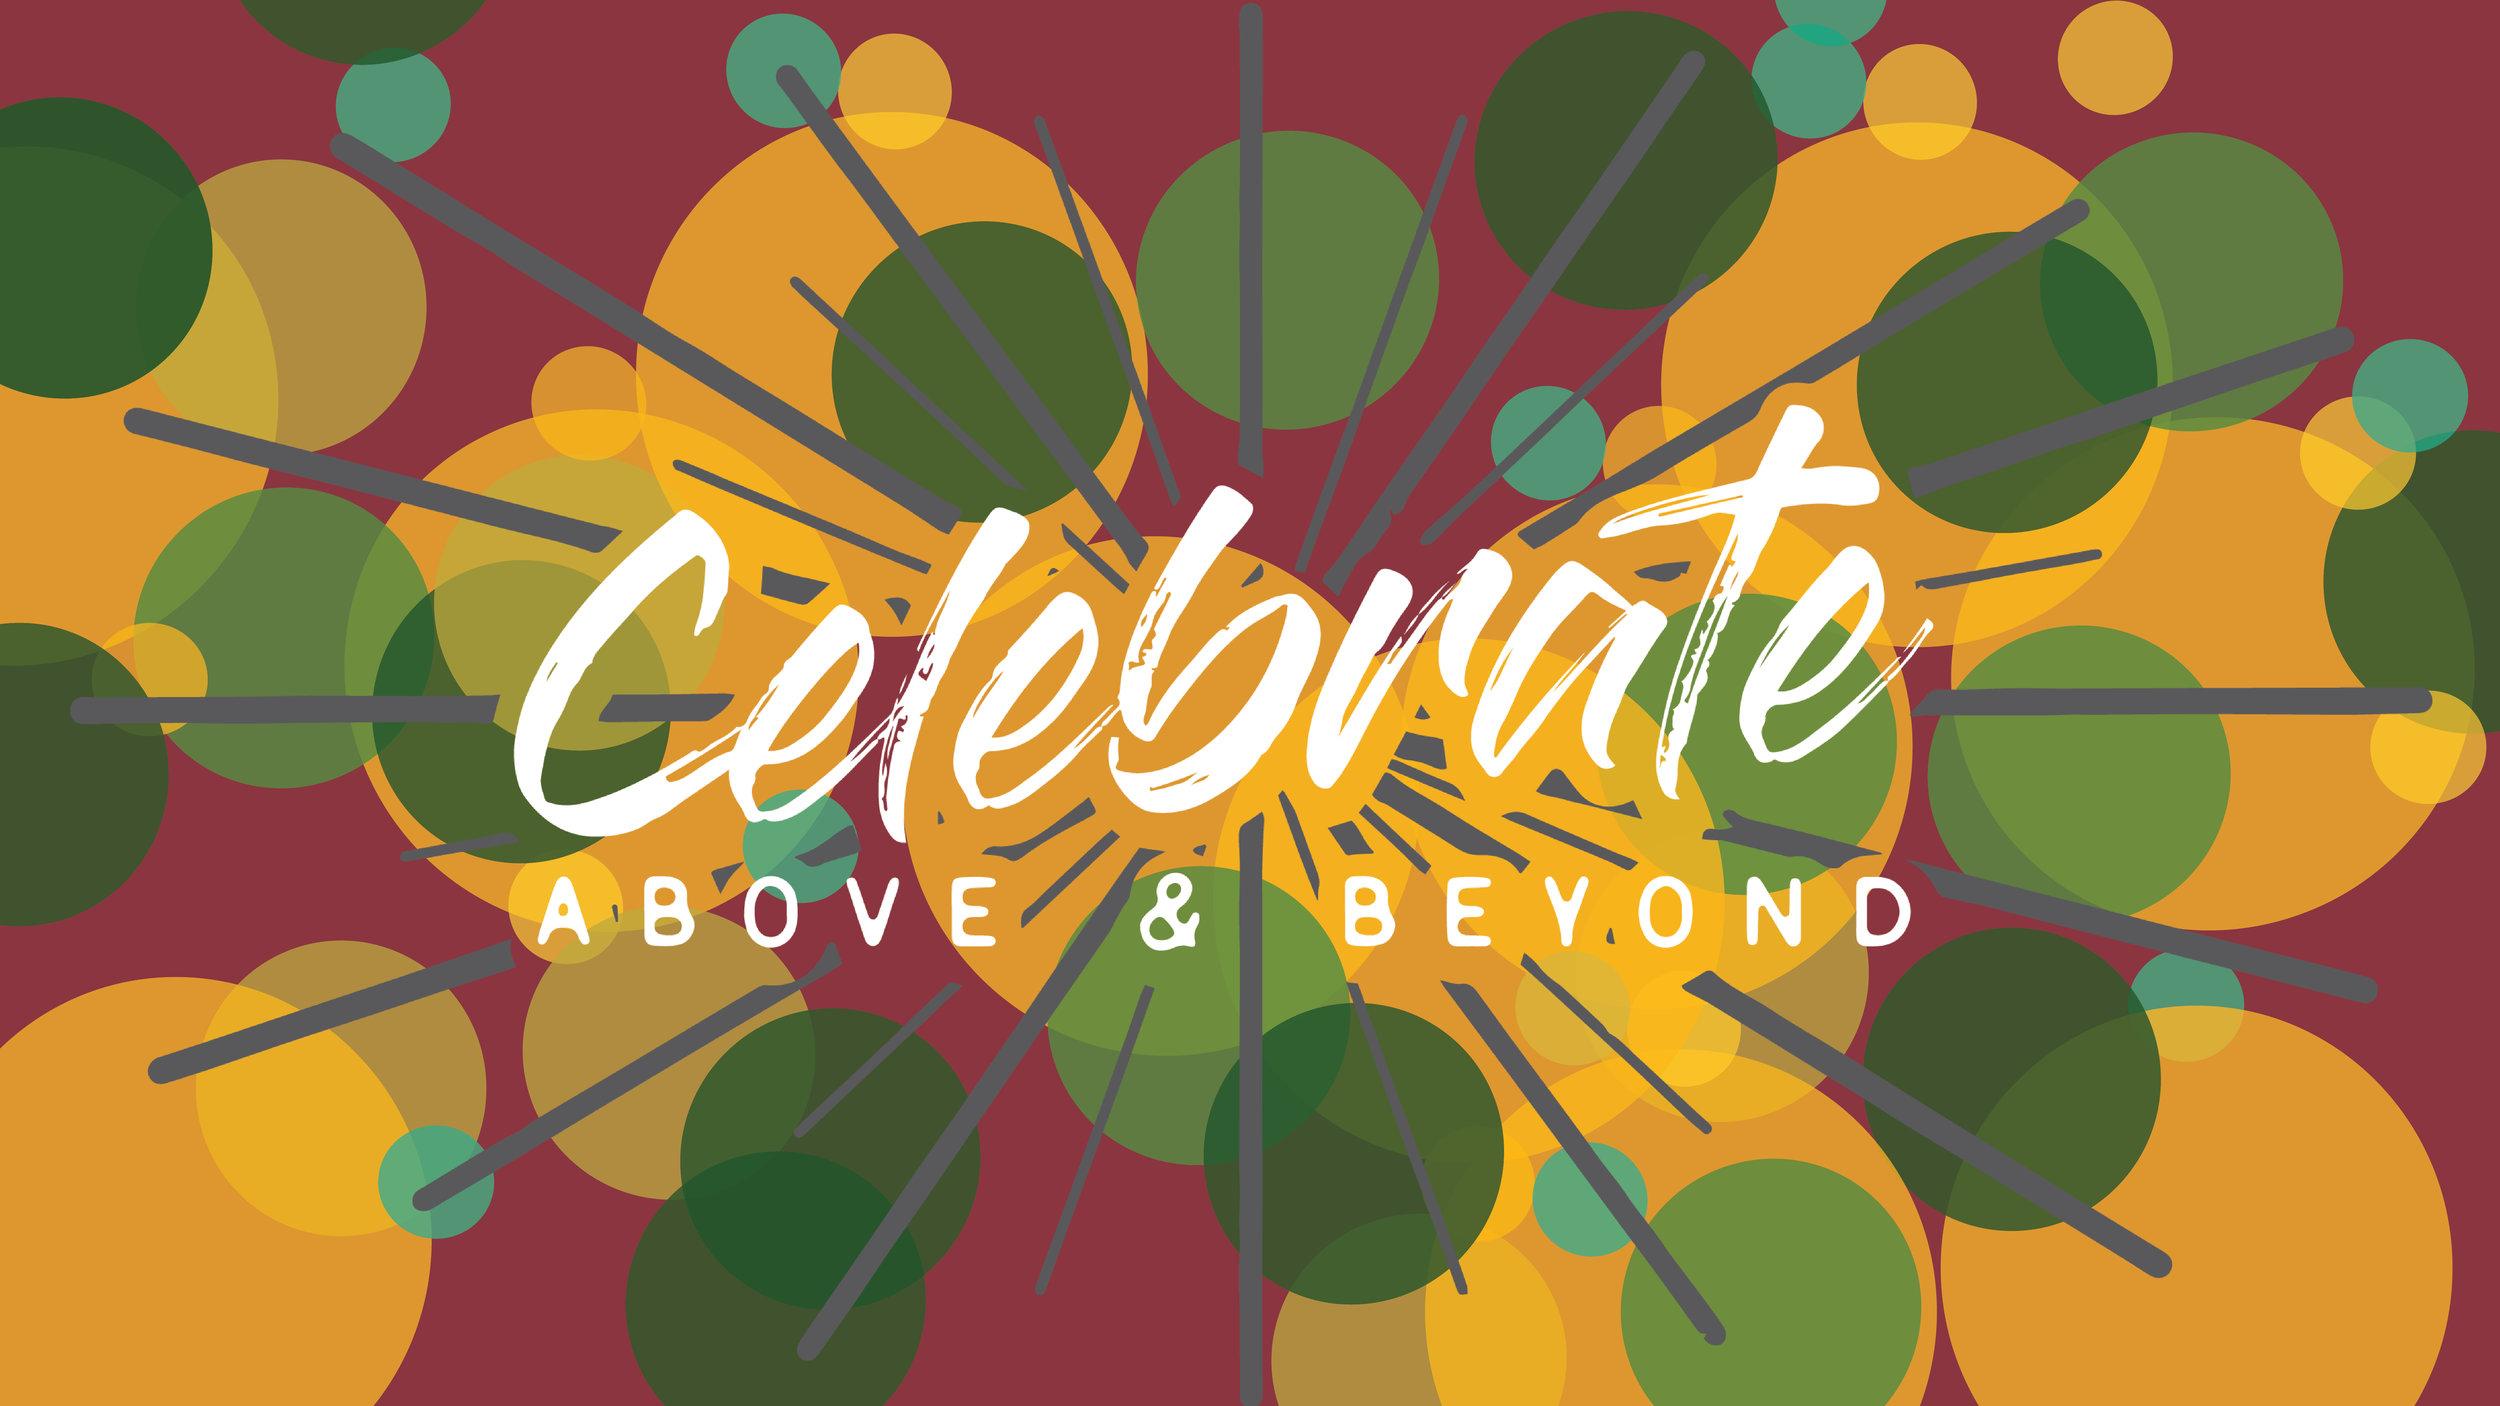 Celebrate Above and Beyond design 2.jpg